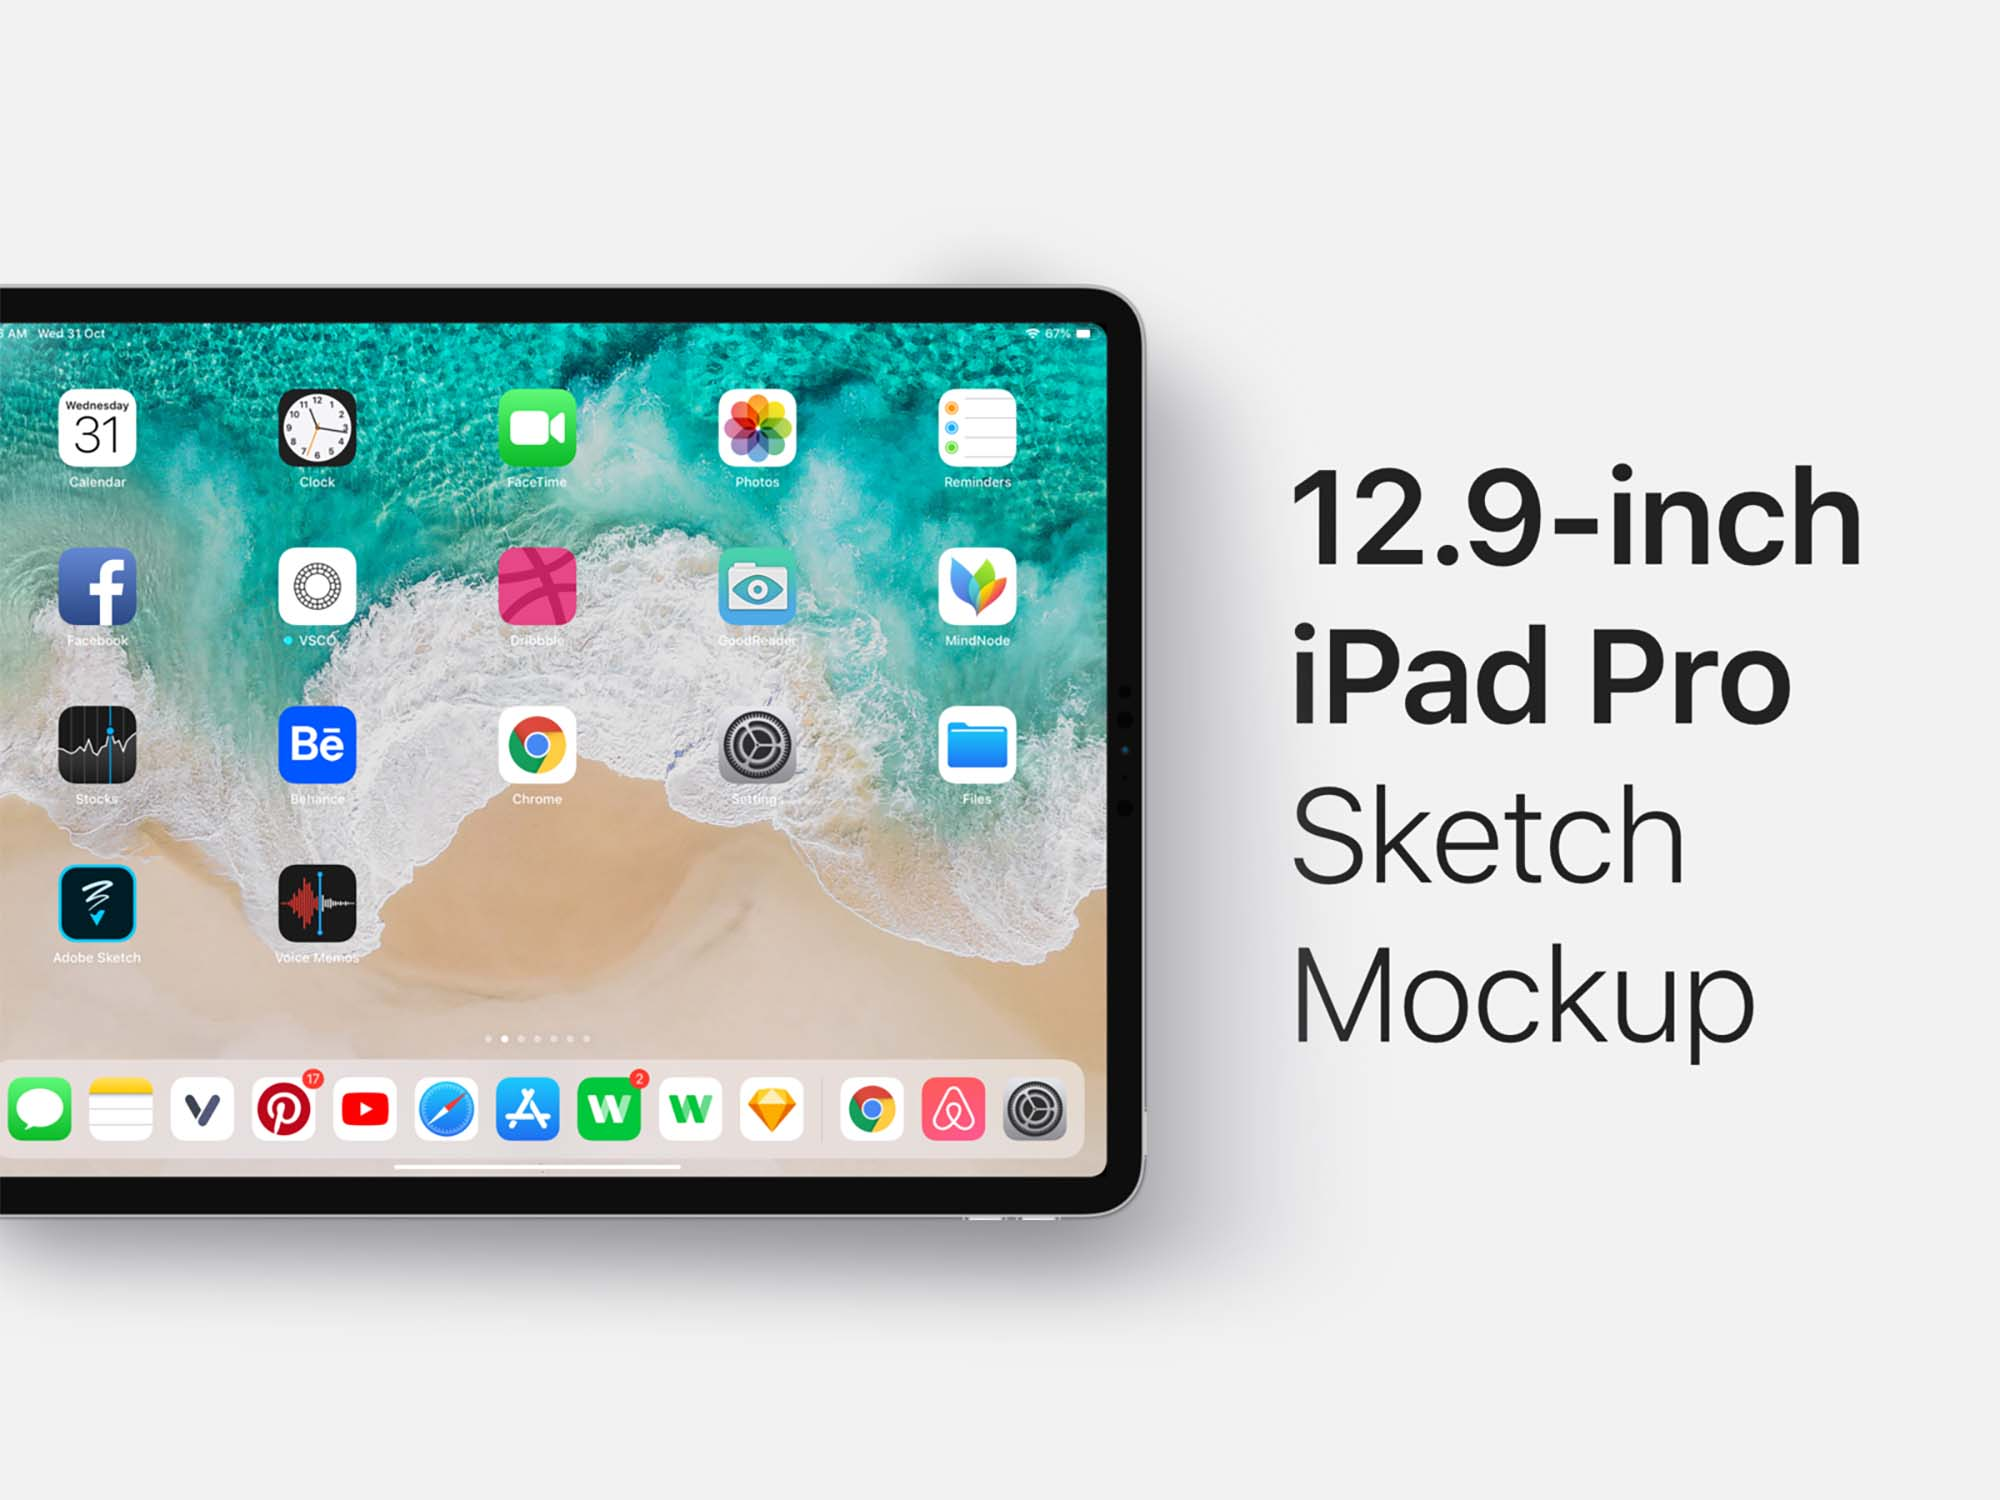 12.9 Inch iPad Pro Mockup